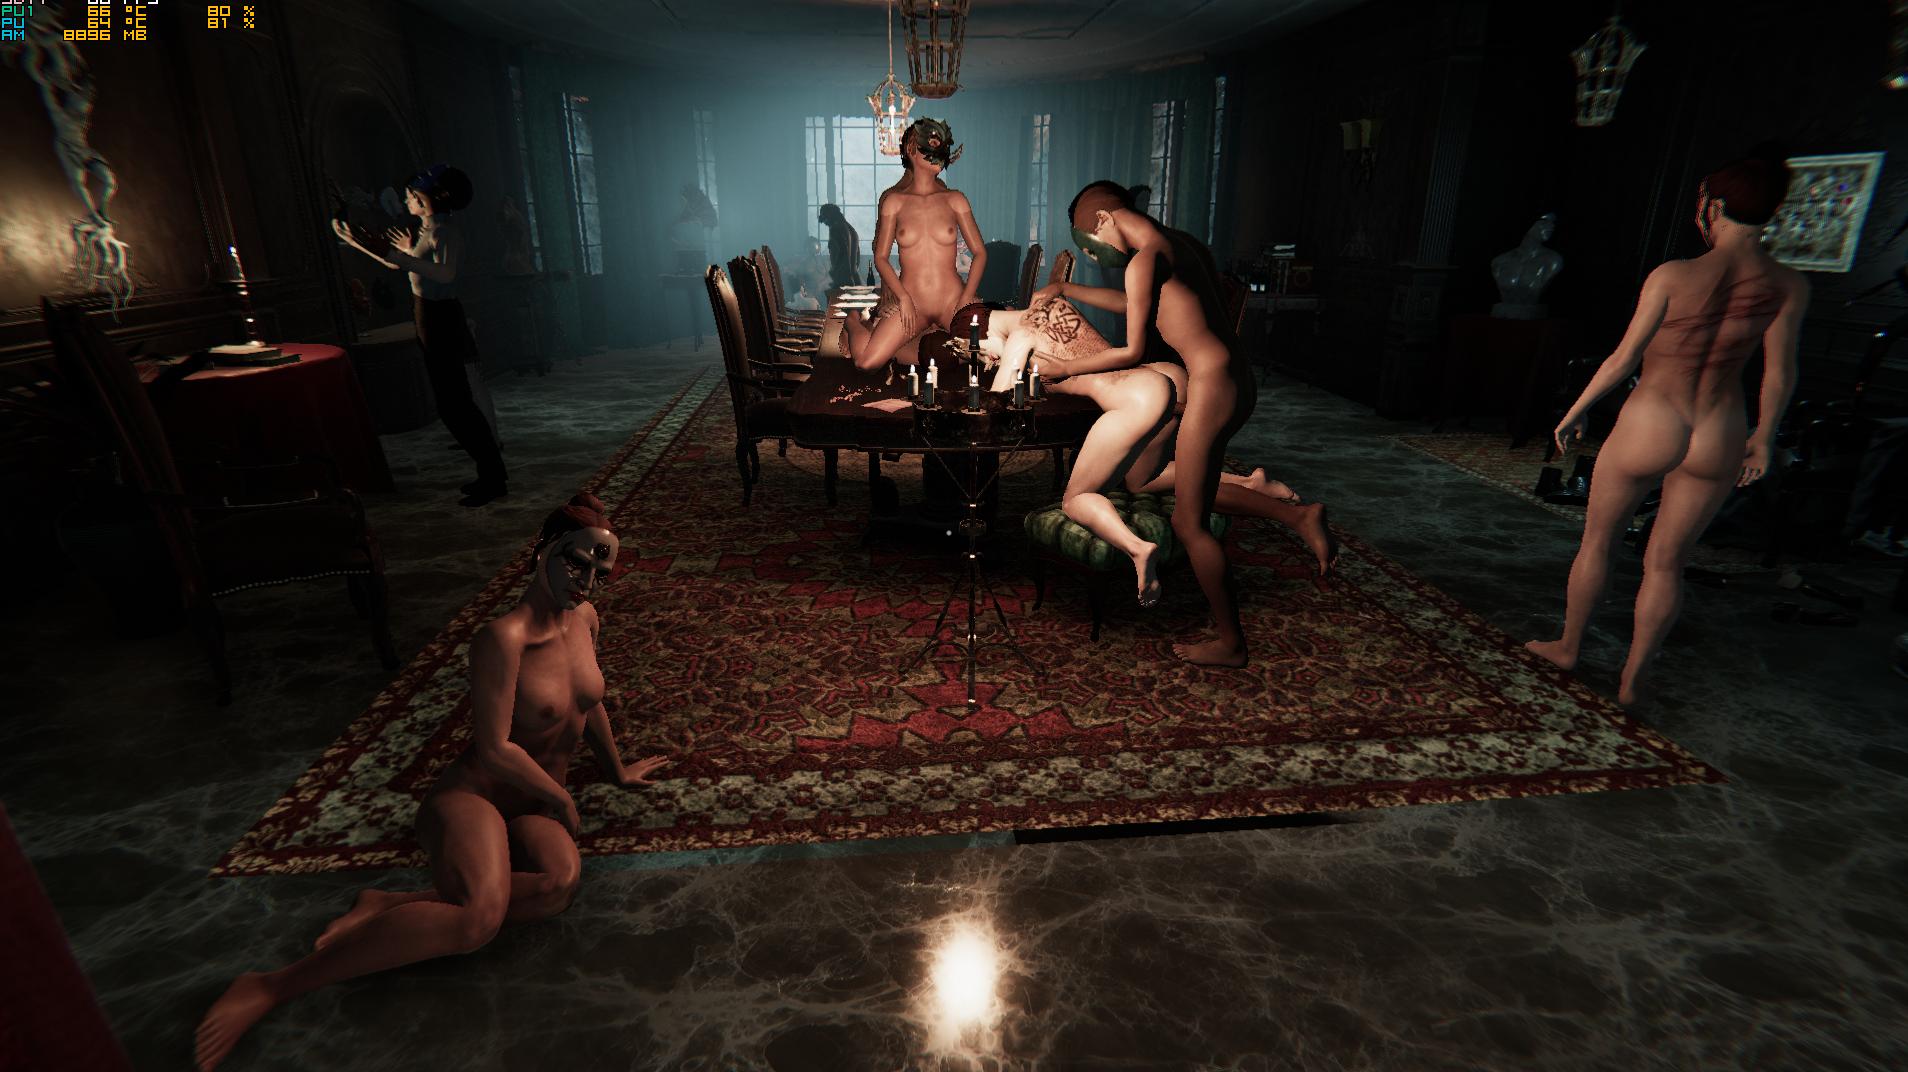 БДСМ и Оргии - Lust from Beyond